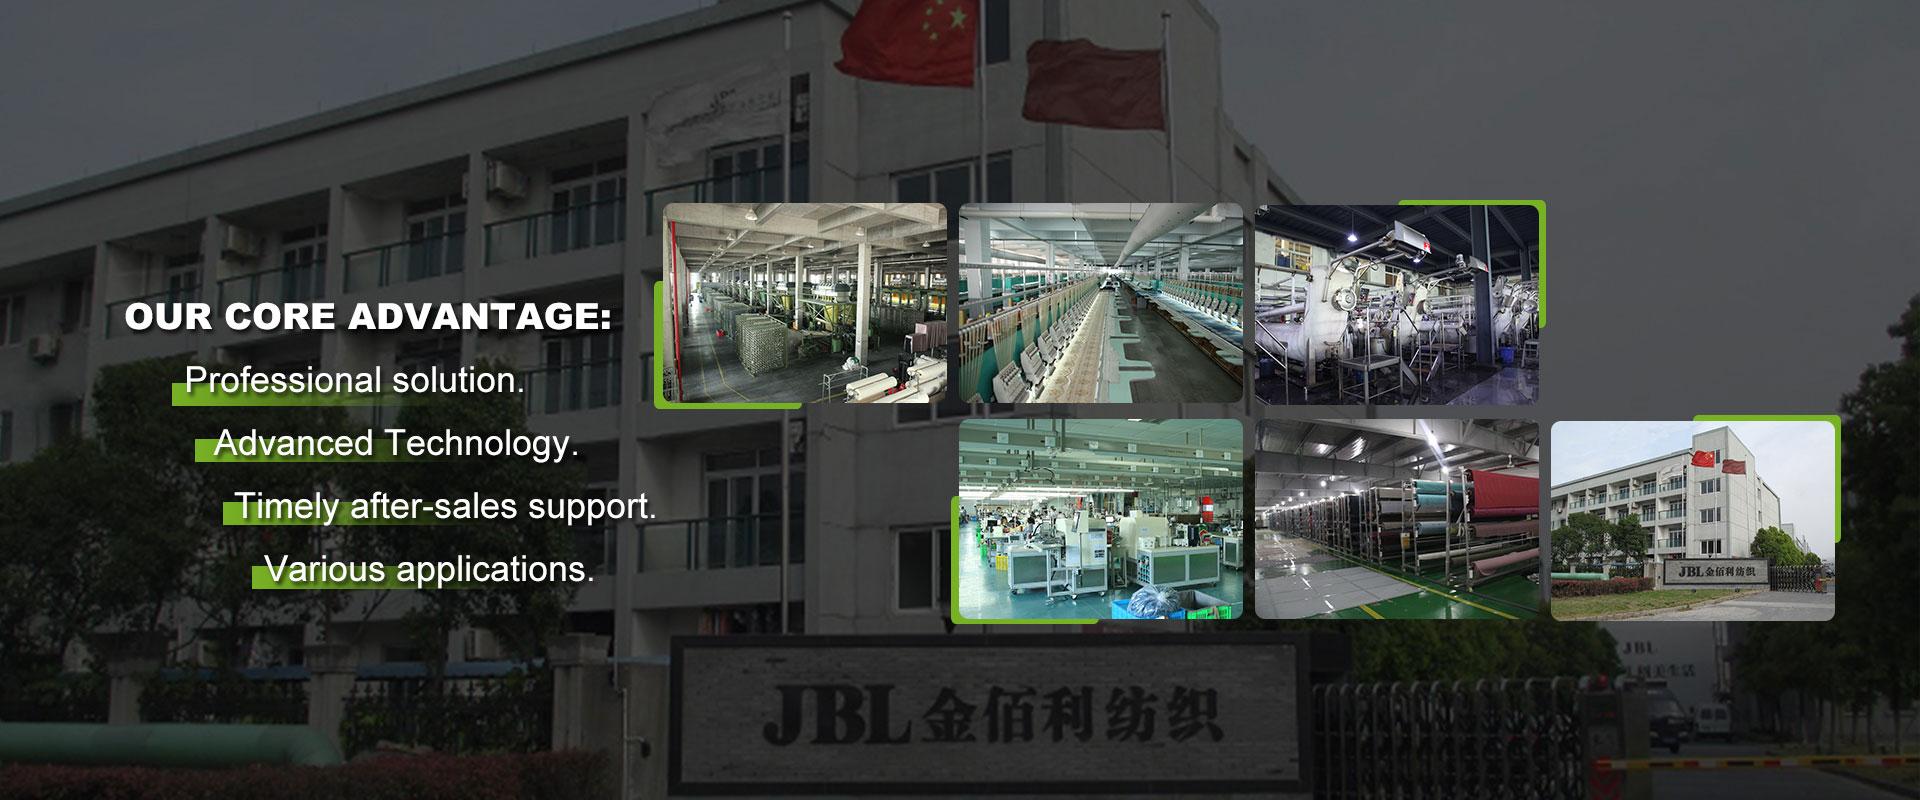 Haining Jinbaili Textile Co., Ltd.